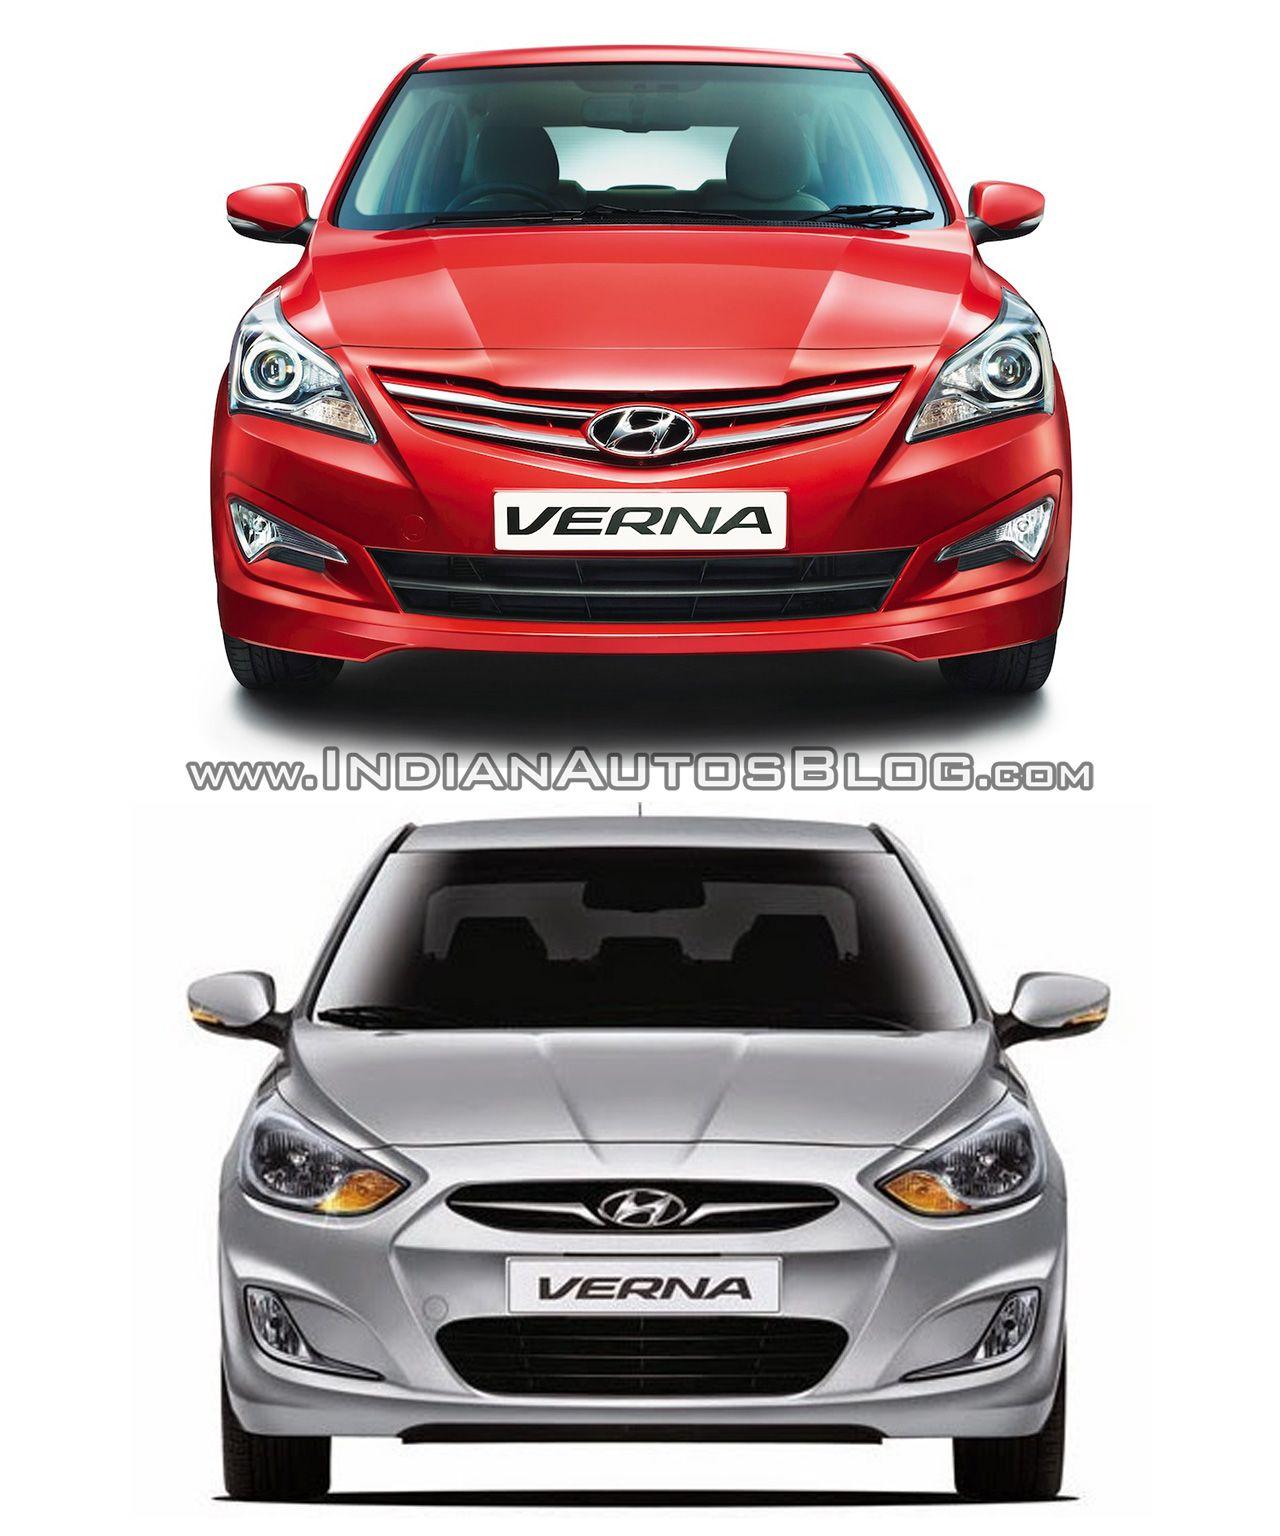 Hyundai Verna Facelift Vs Hyundai Verna Old Vs New Hyundai Cars Hyundai Olds